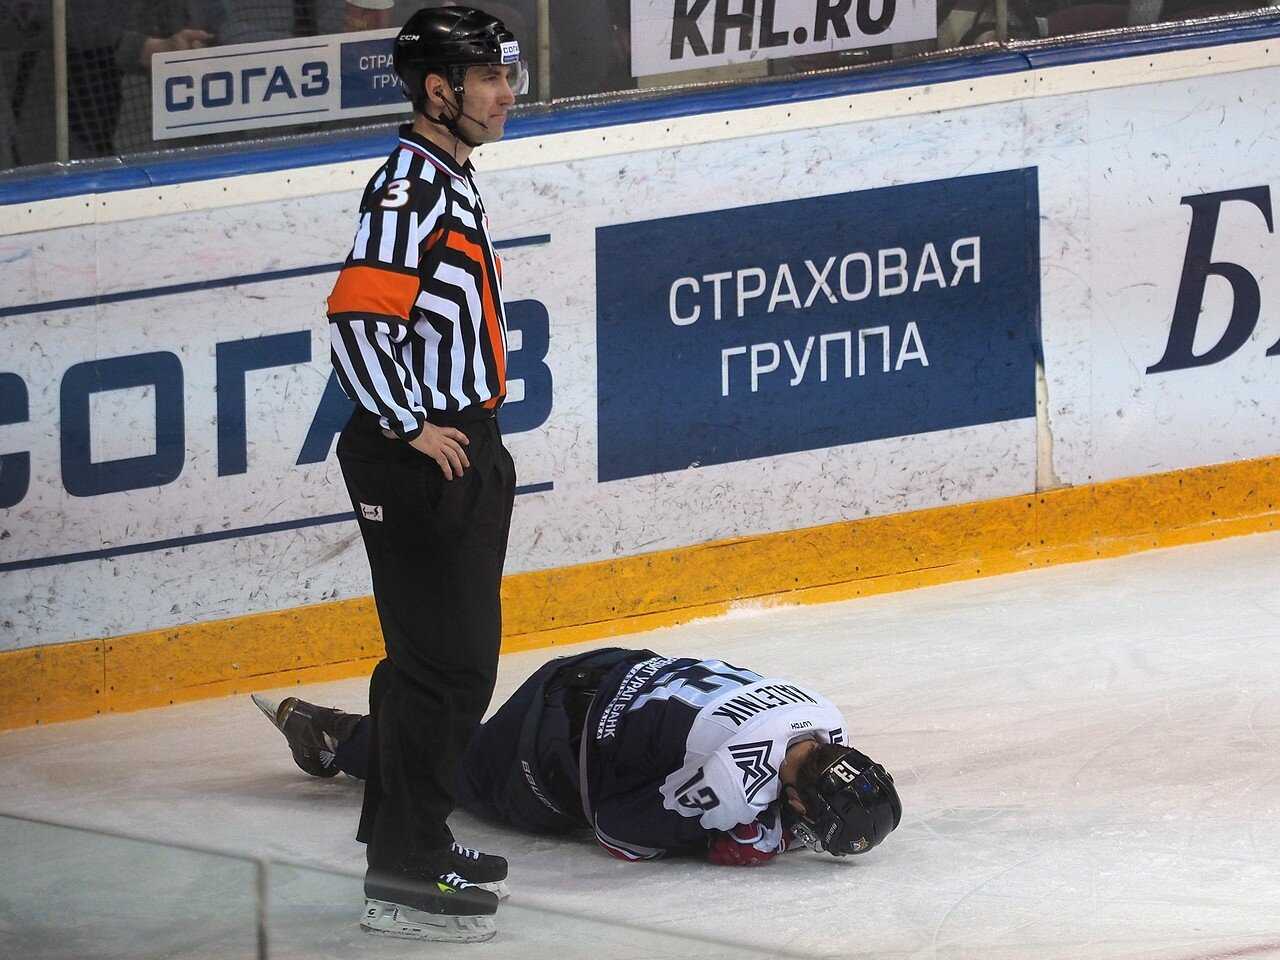 86Плей-офф 2016 Восток Финал Металлург - Салават Юлаев 23.03.2016